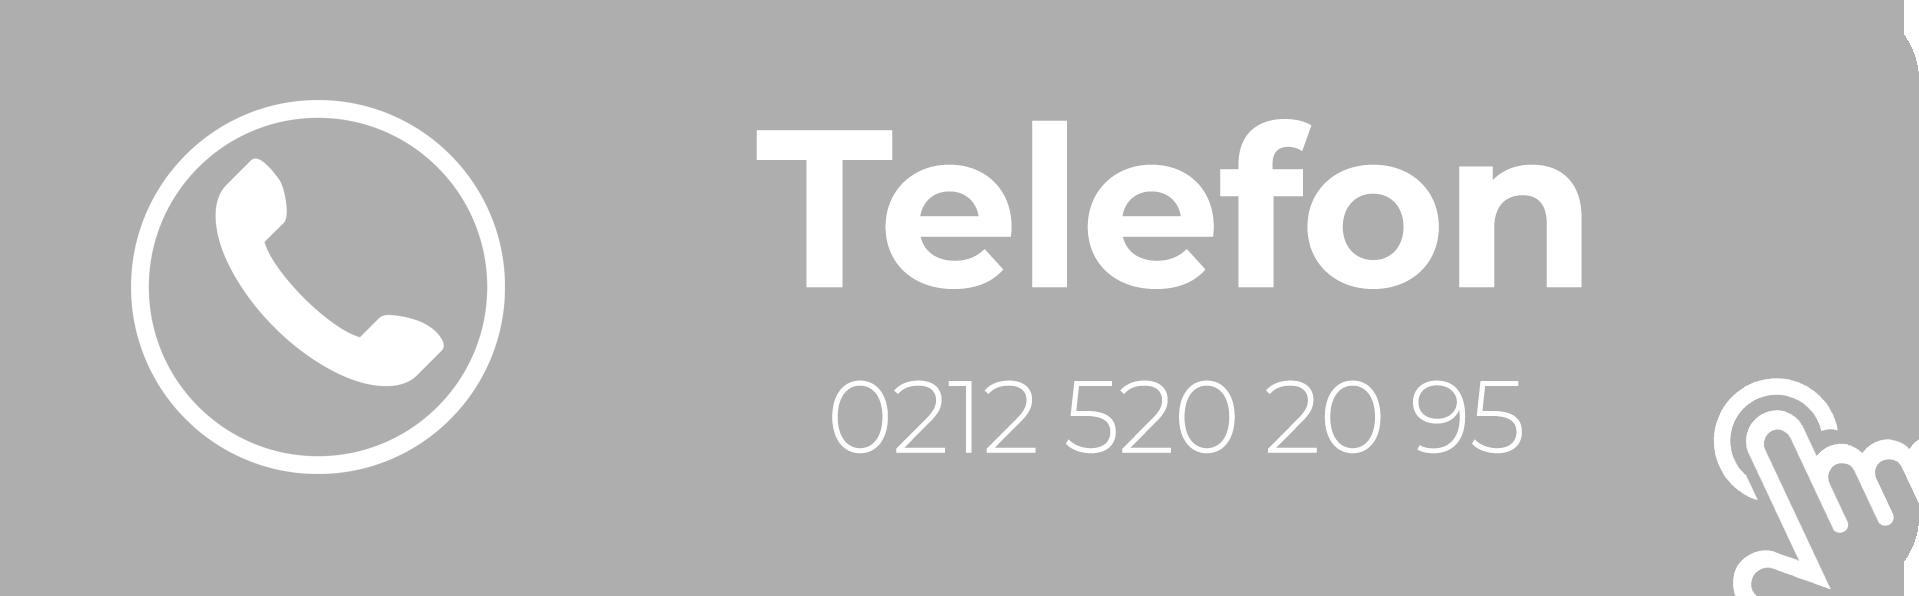 tel-iletisim.png (43 KB)